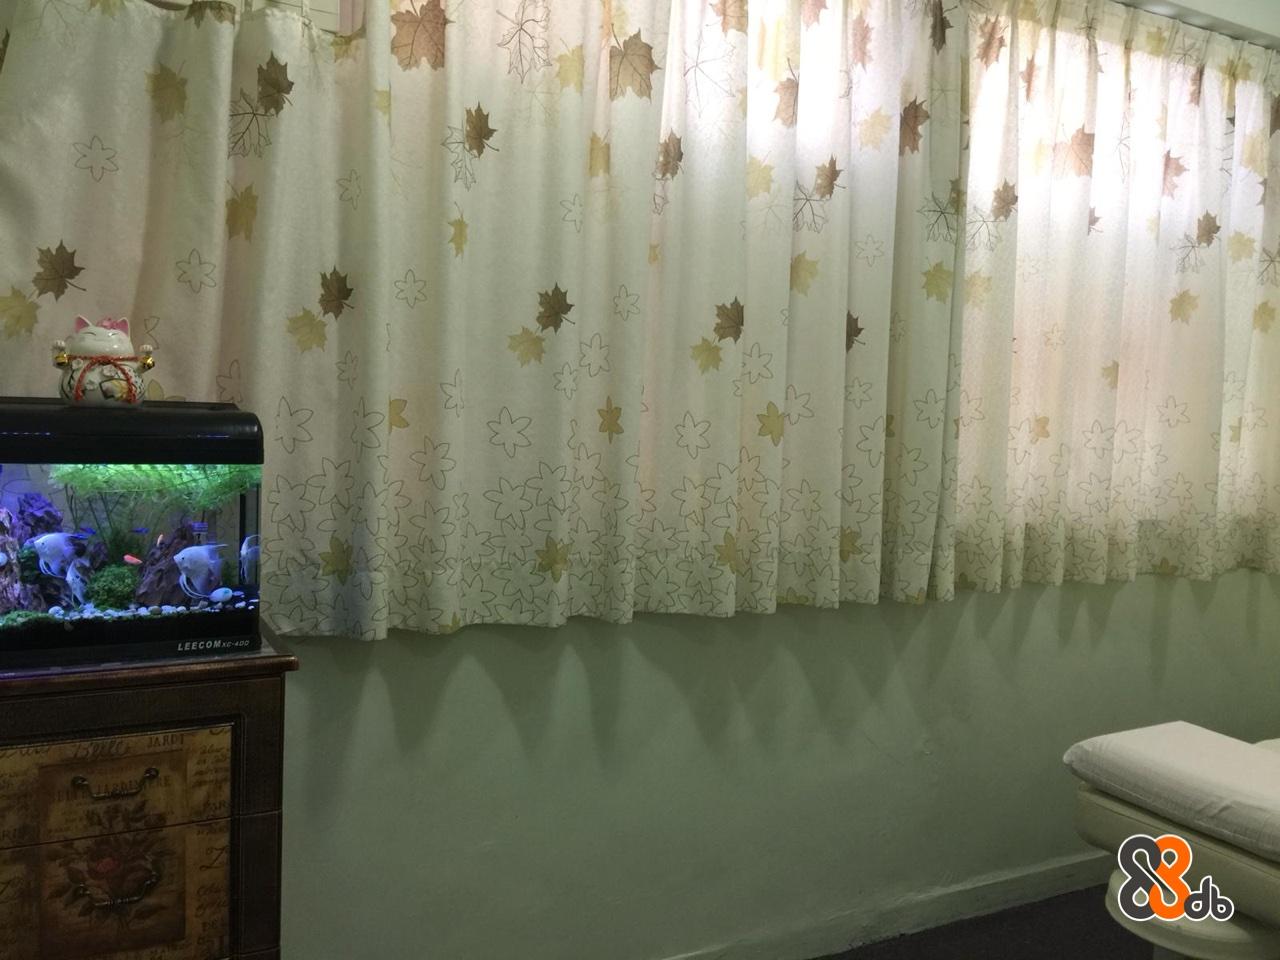 LEECOMxc 4  curtain,interior design,textile,window treatment,wall